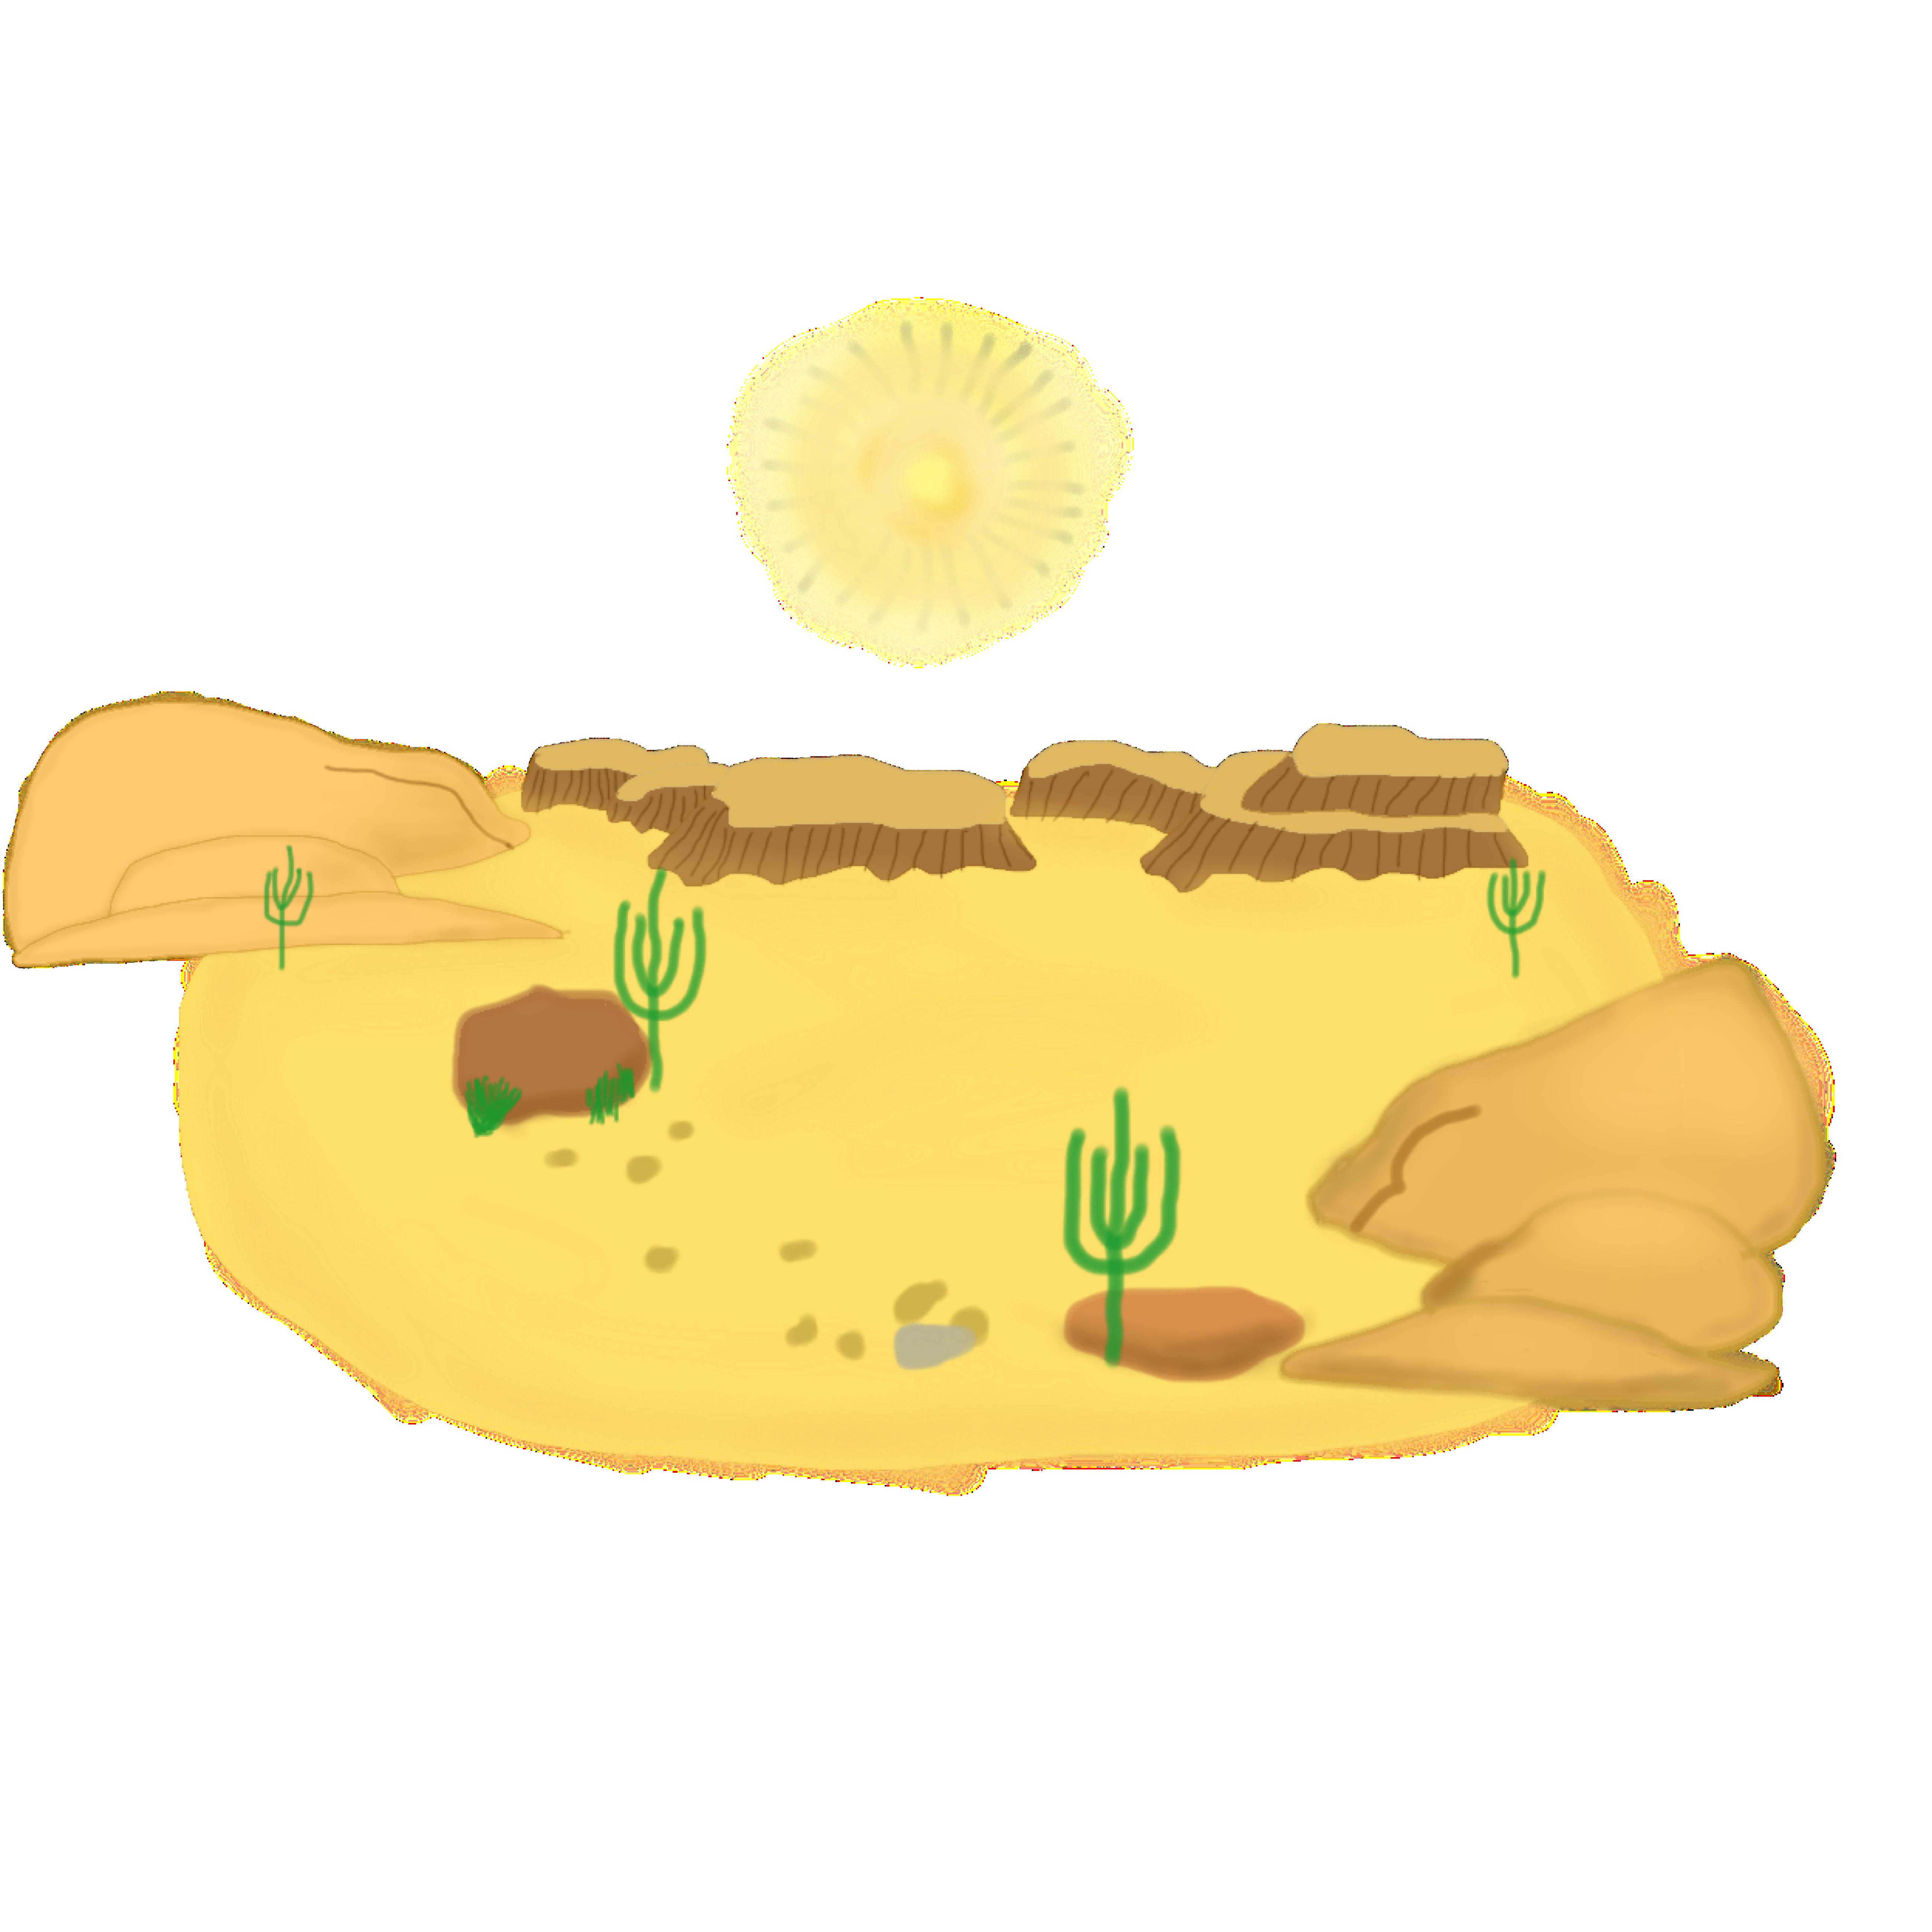 Desert clipart desert scenery.  collection of free